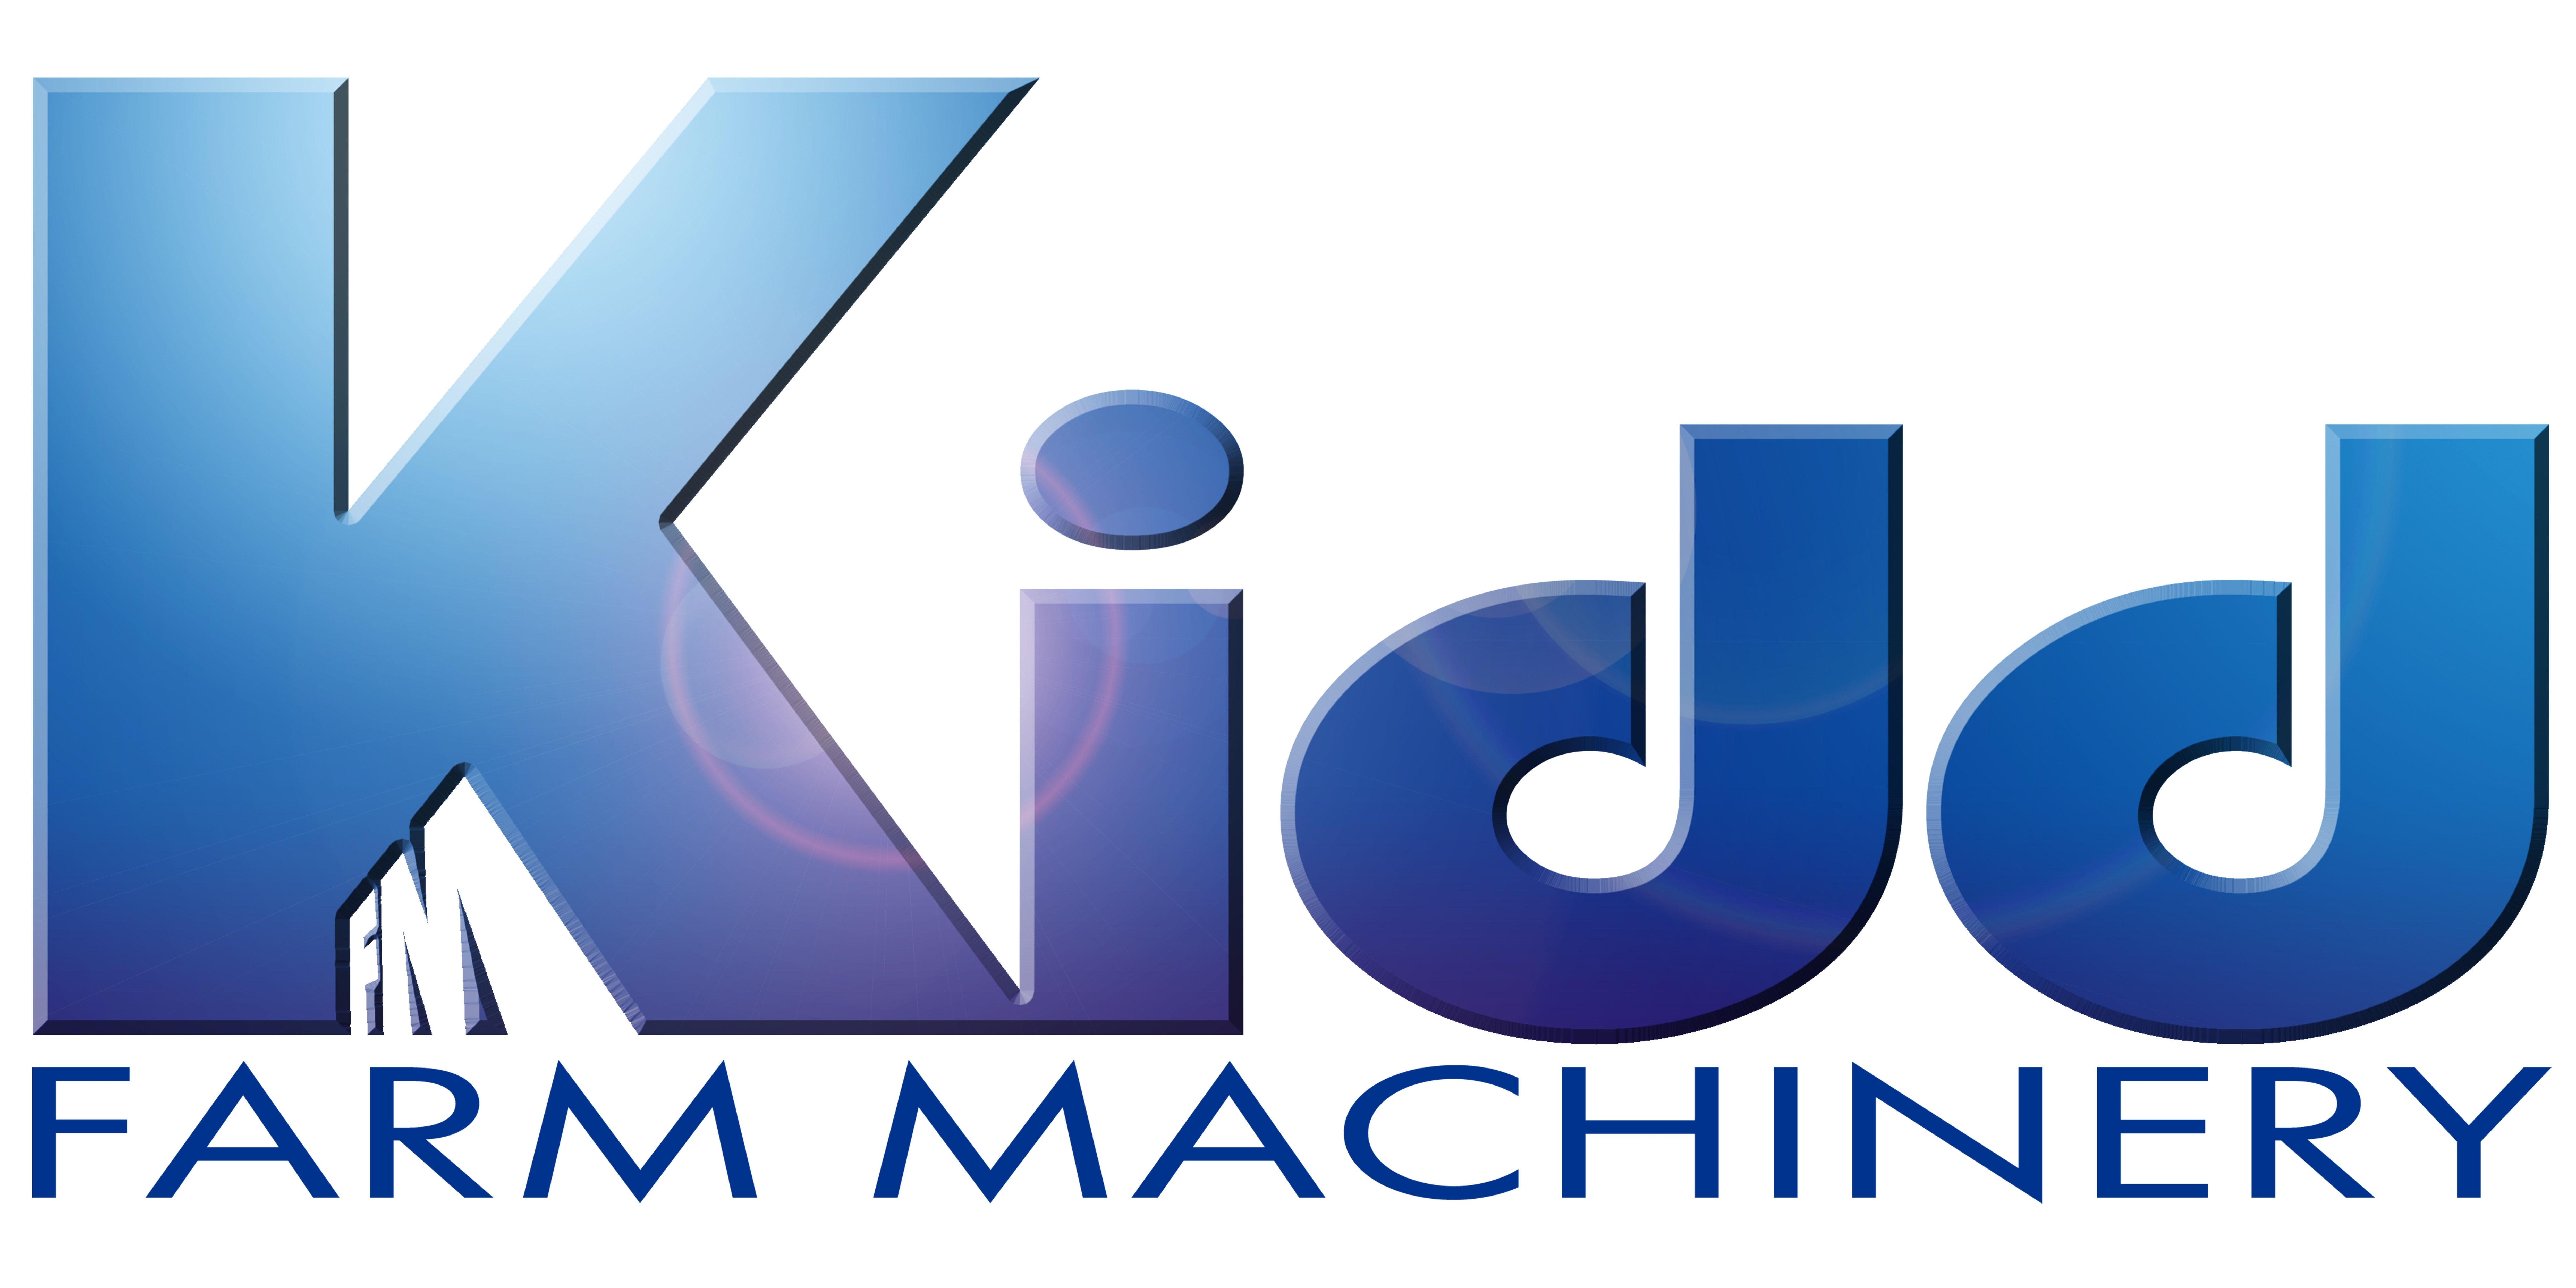 Kidd Farm Machinary logo